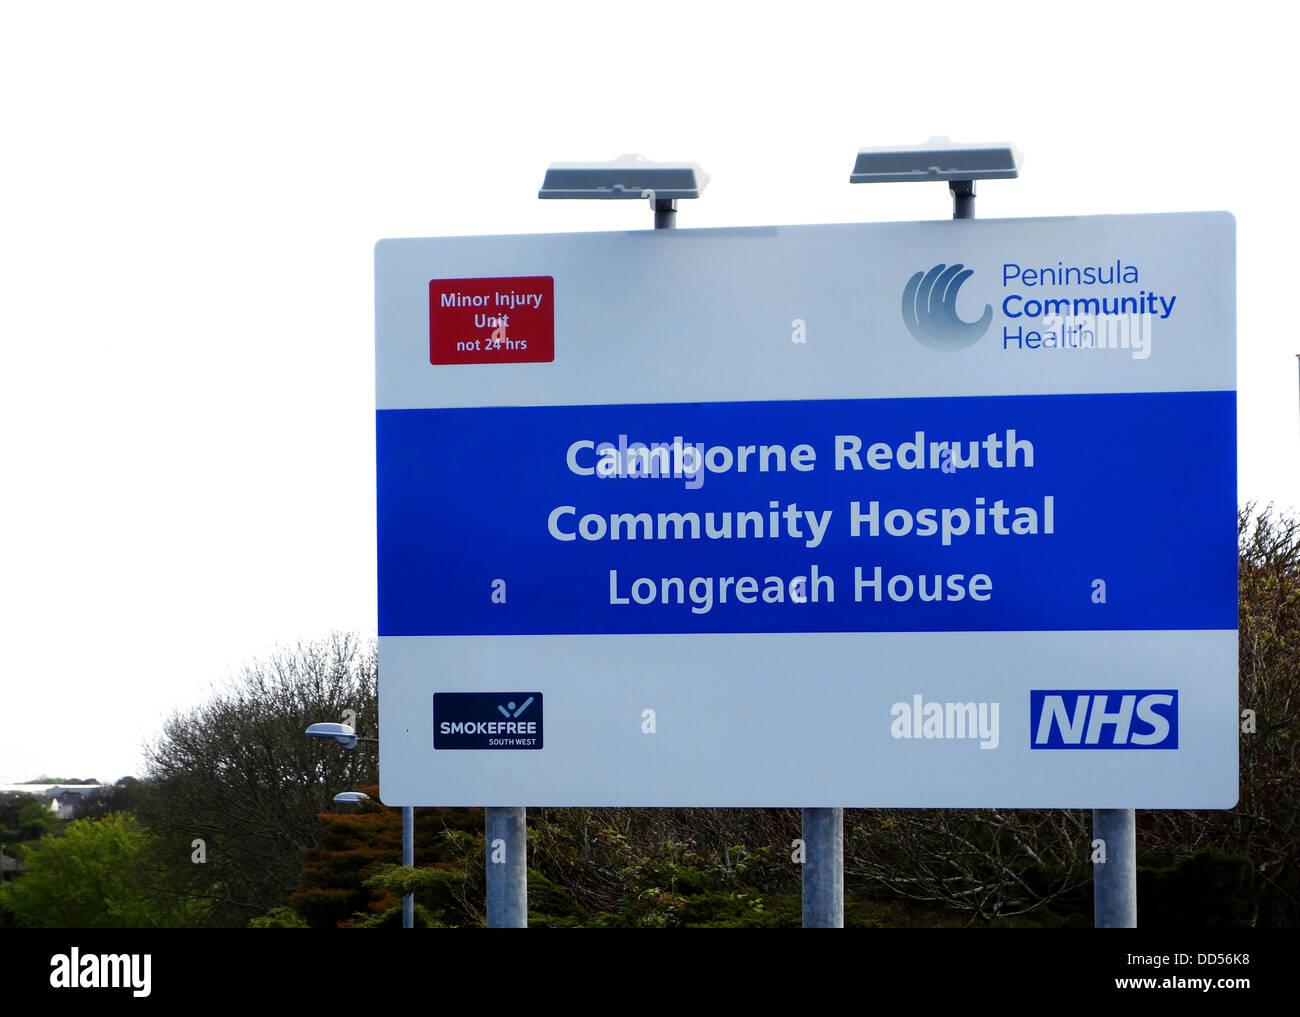 camborne / redruth community hospital sign, cornwall, uk - Stock Image